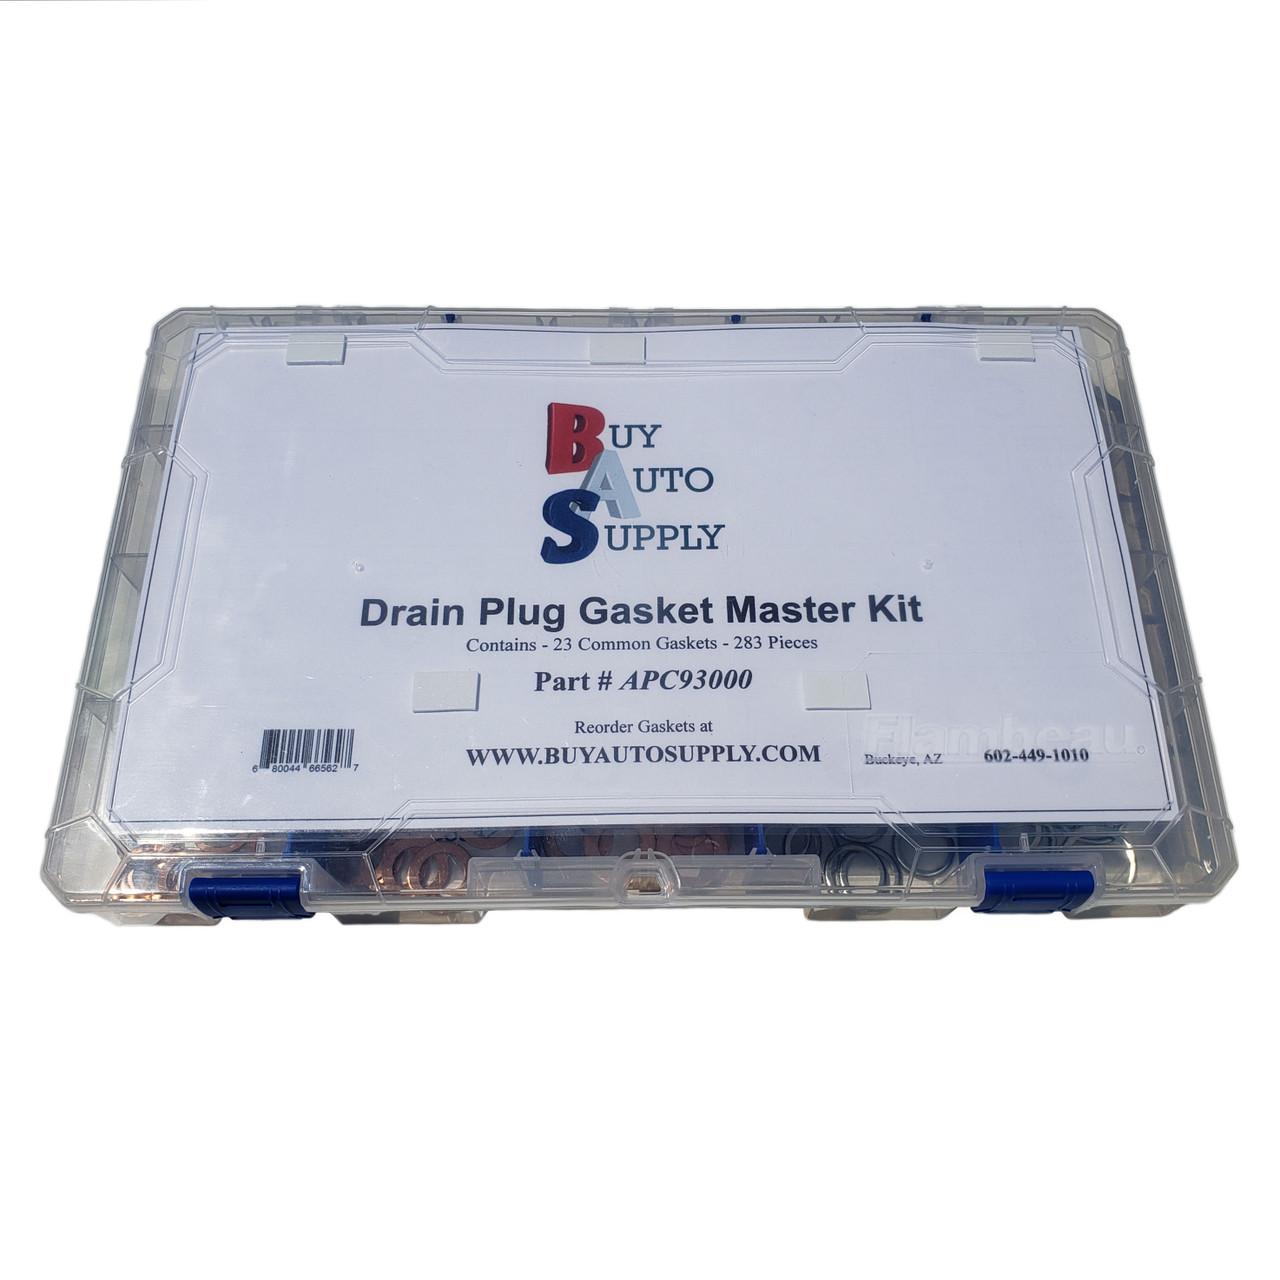 Oil Drain Plug Gaskets Fiber Washer Assortment Kit by A Plus Parts House